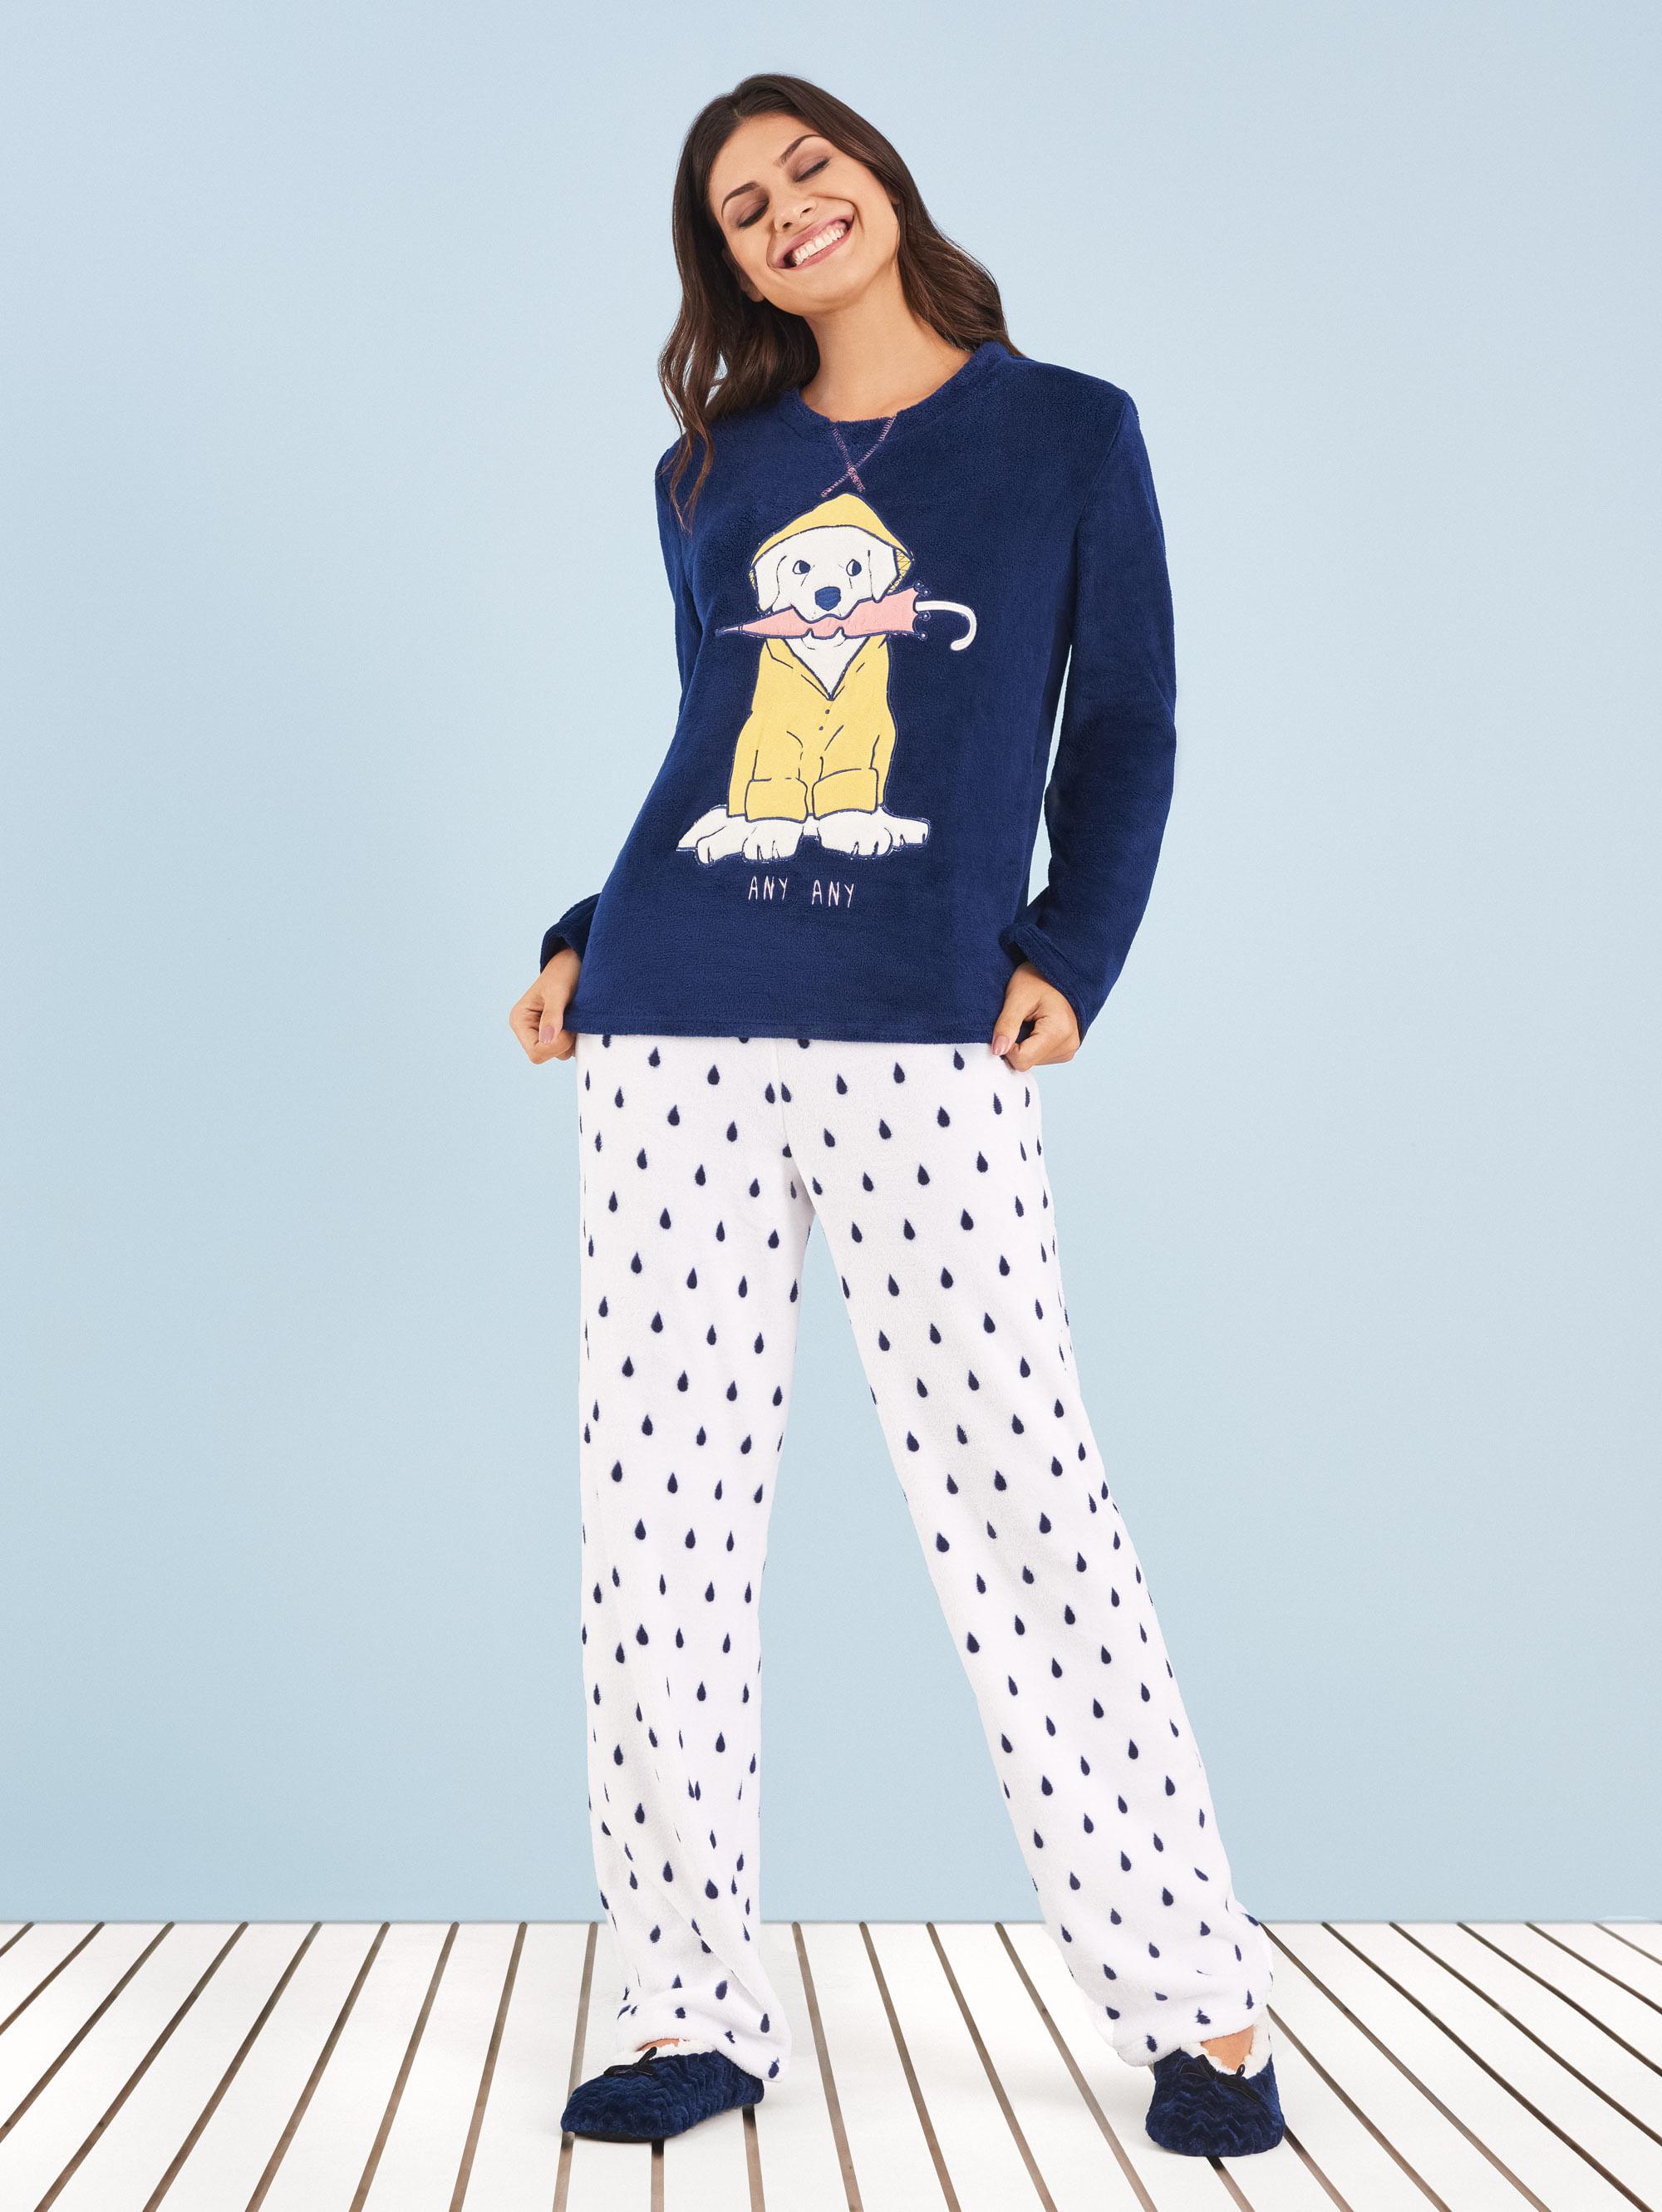 pijama-manga-longa-soft-golden-chuva-any-any